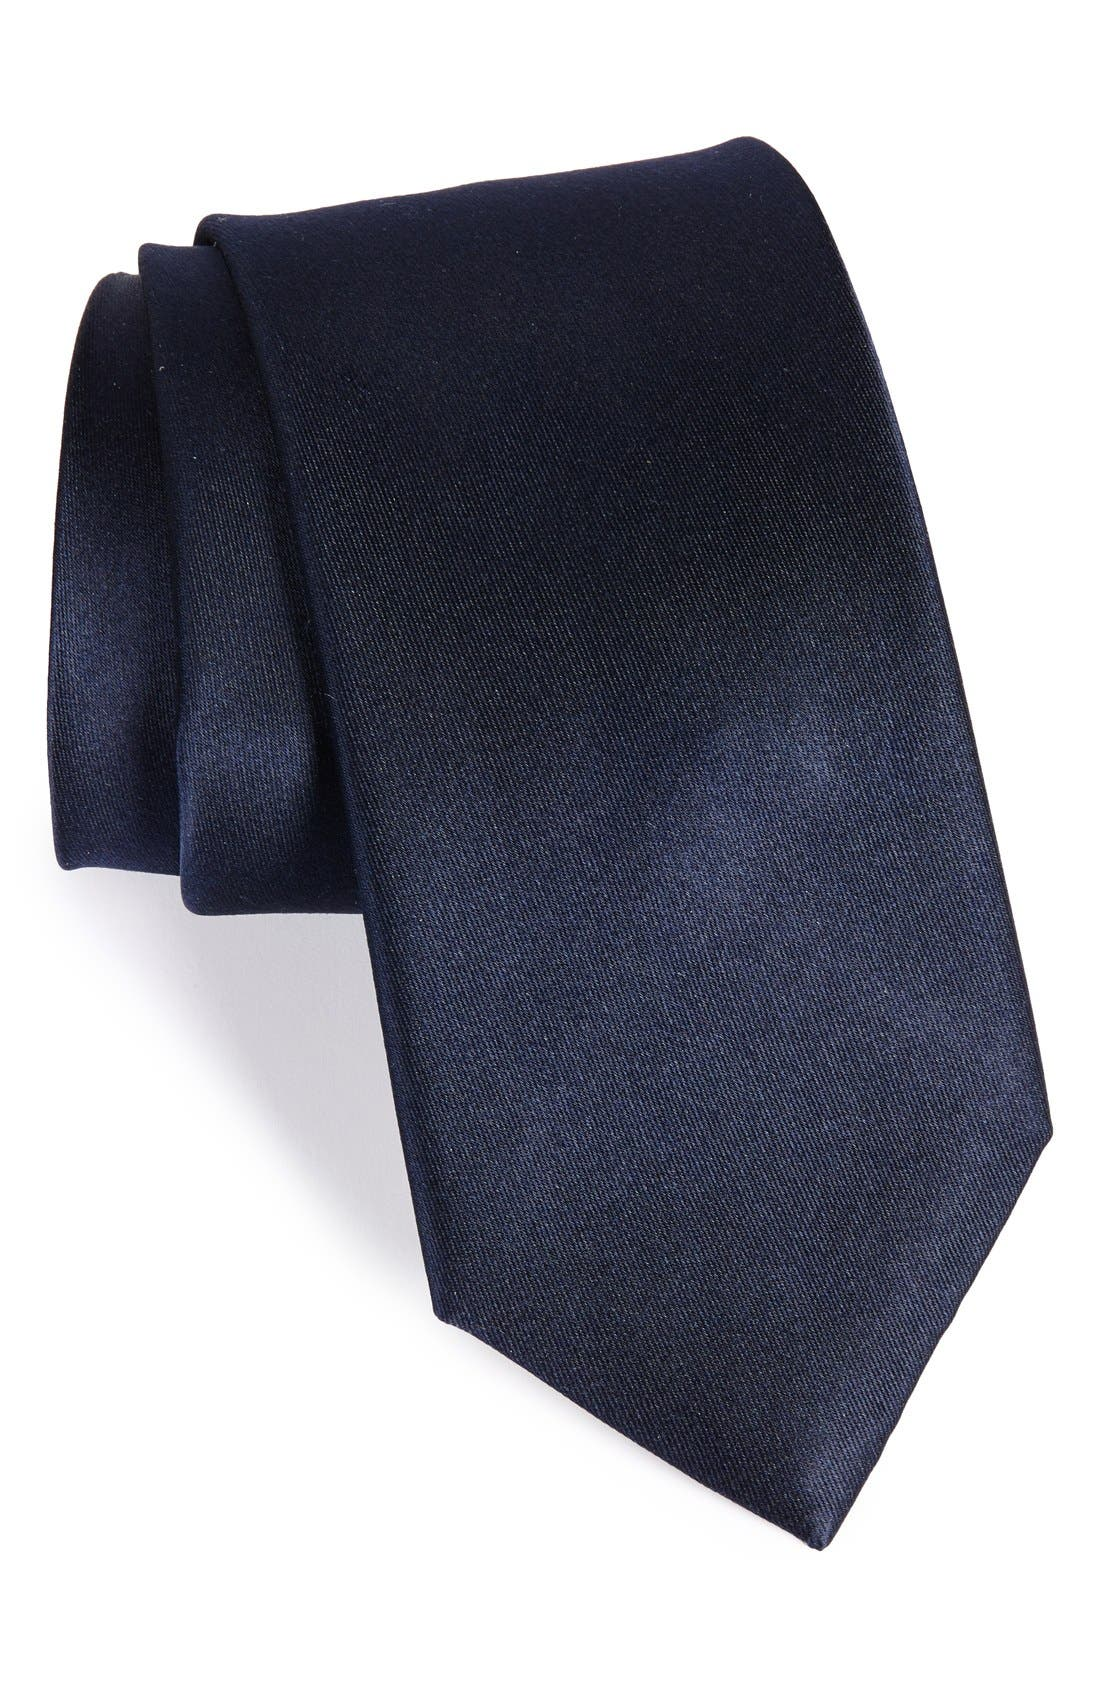 Main Image - Nordstrom Men's Shop Solid Satin Silk Tie